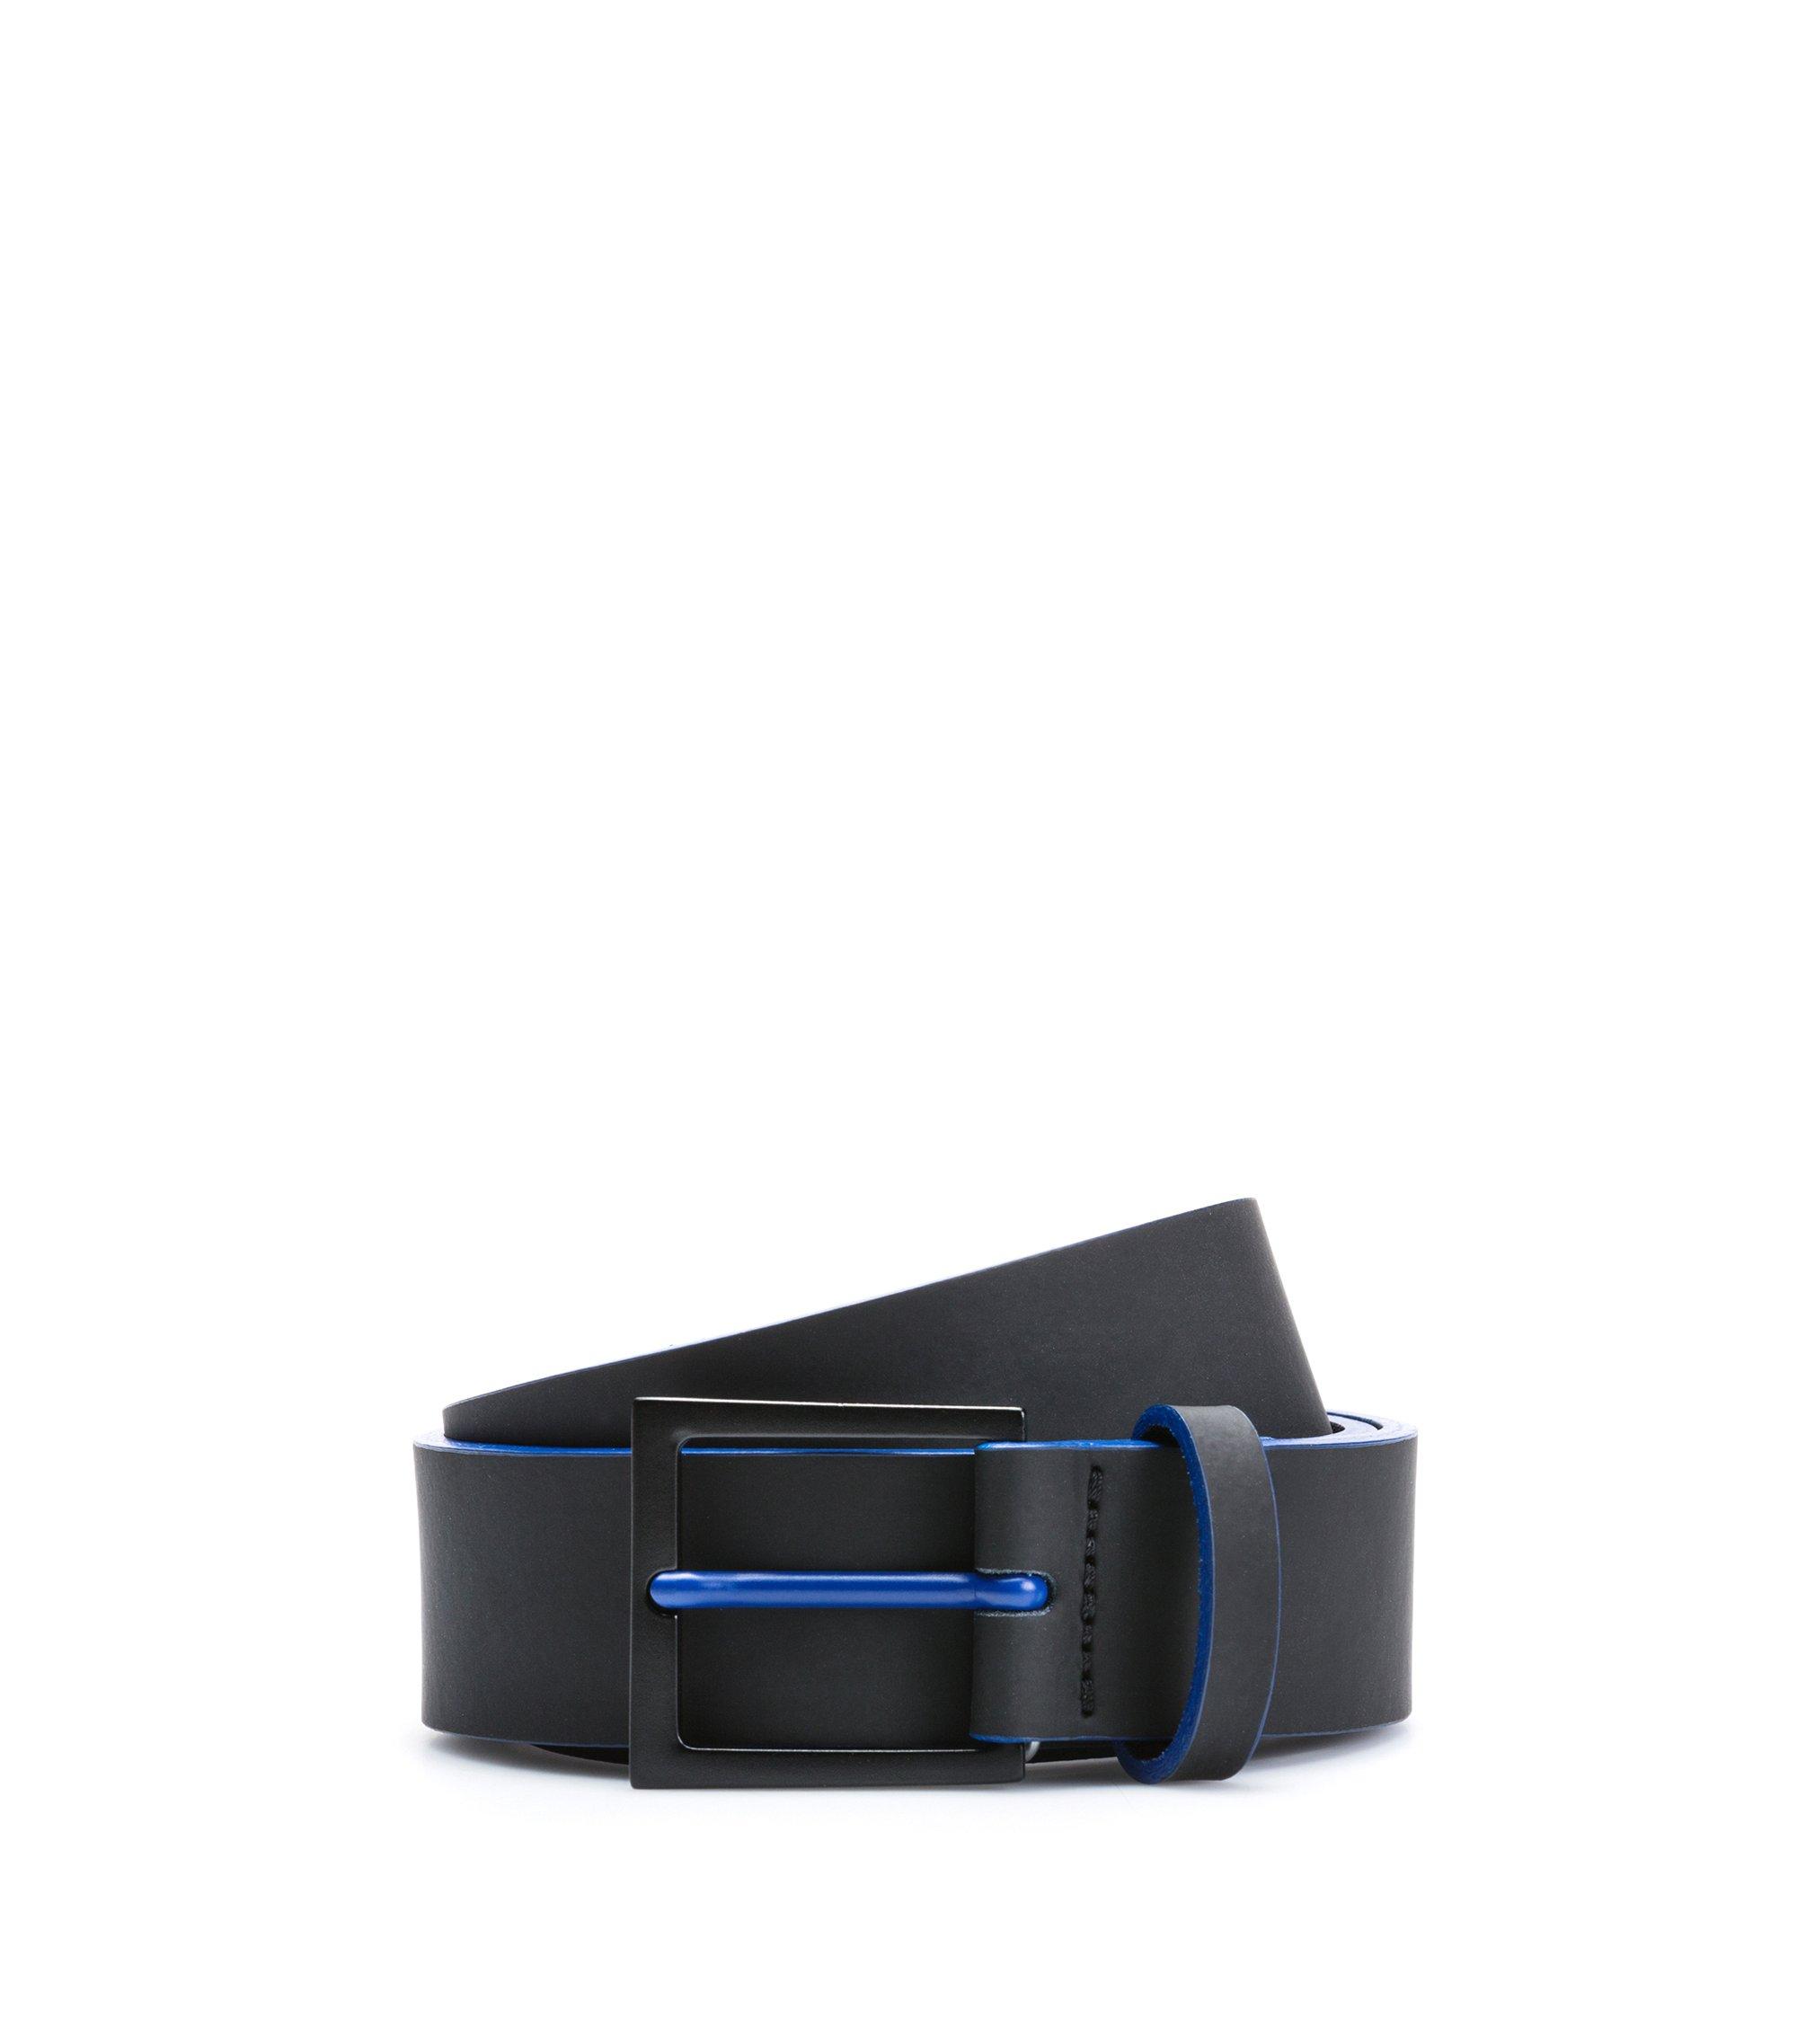 Rubberized-leather belt with matte black hardware, Black